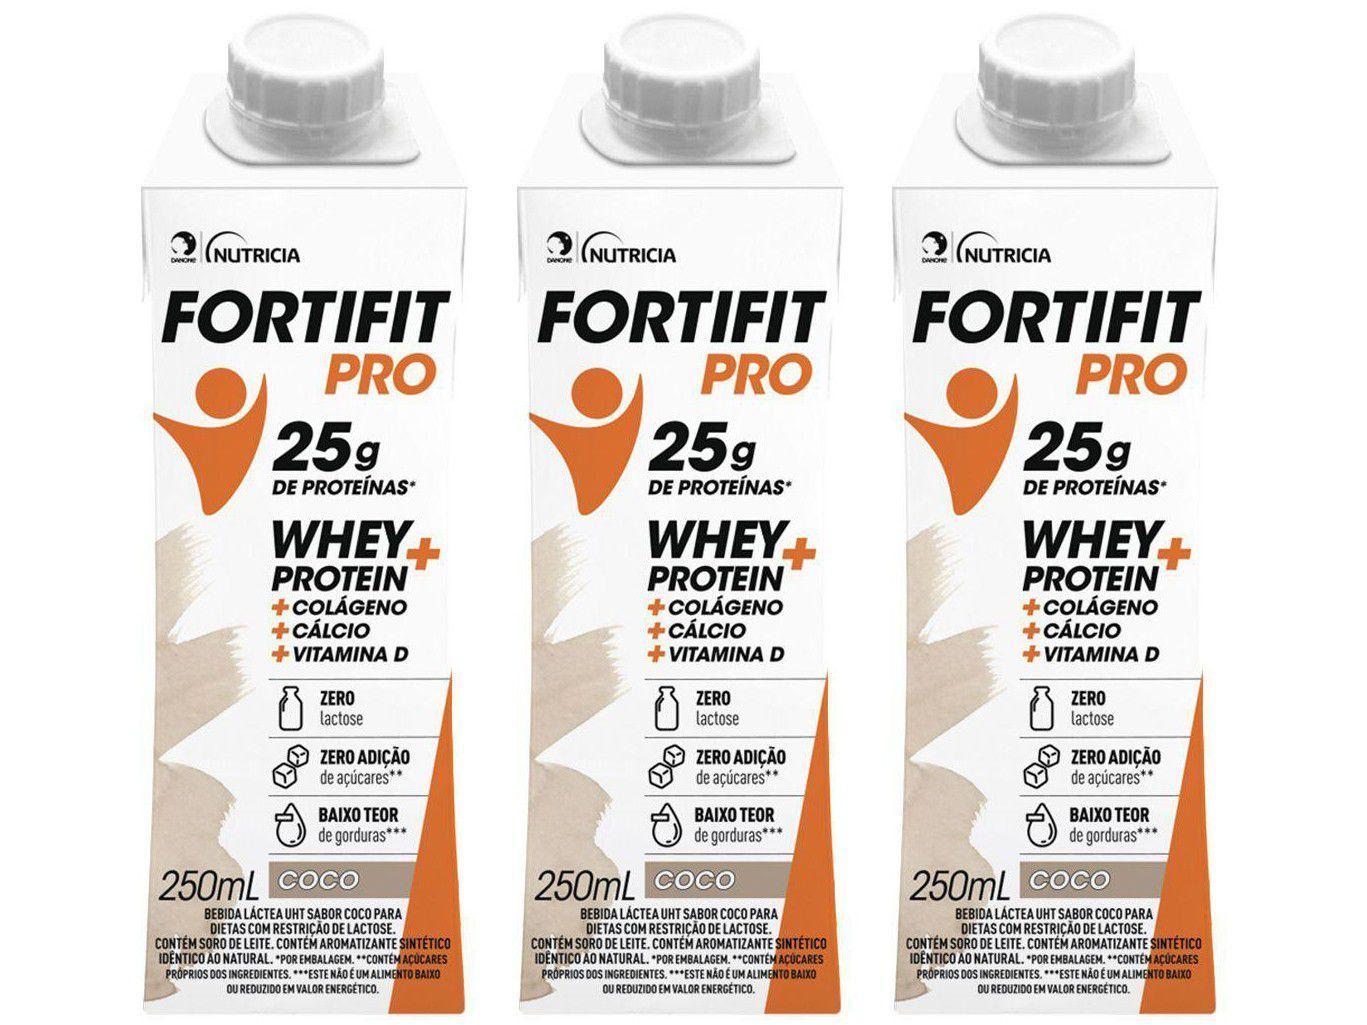 Kit Bebida Láctea Fortifit Pro Coco Zero Açúcar - 250ml 3 Unidades